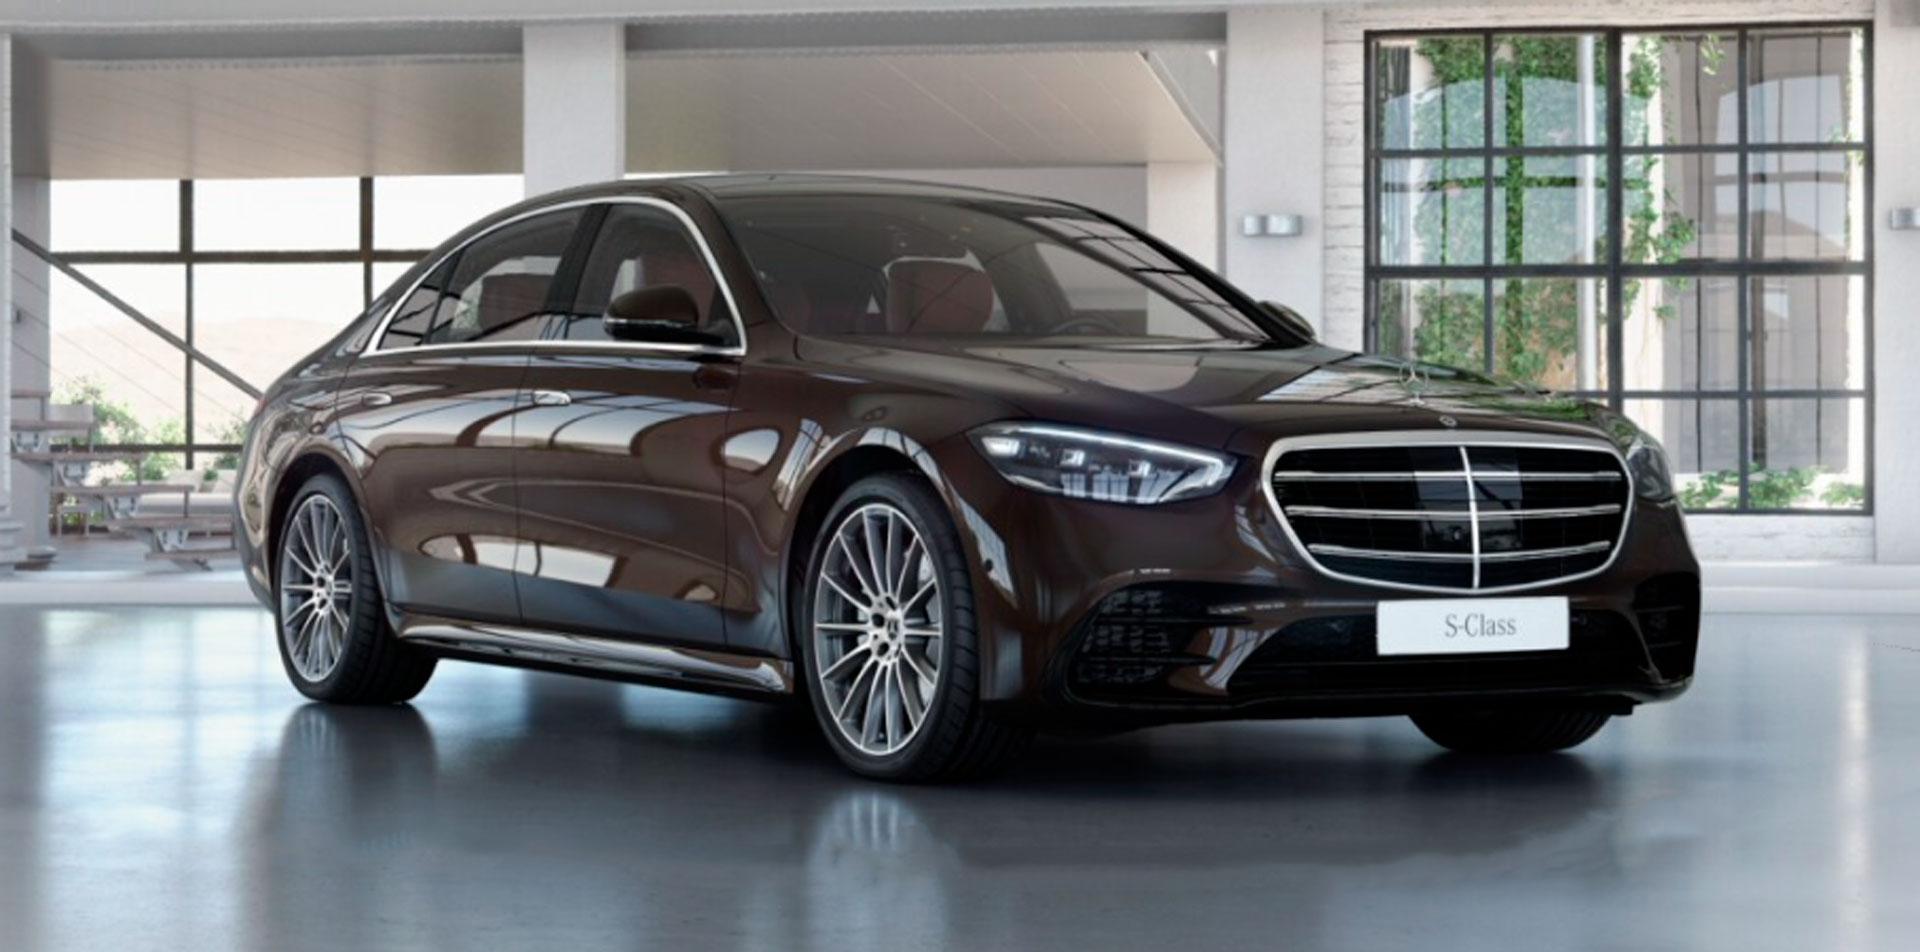 Mercedes-Benz S-Class Limousine 0152601435